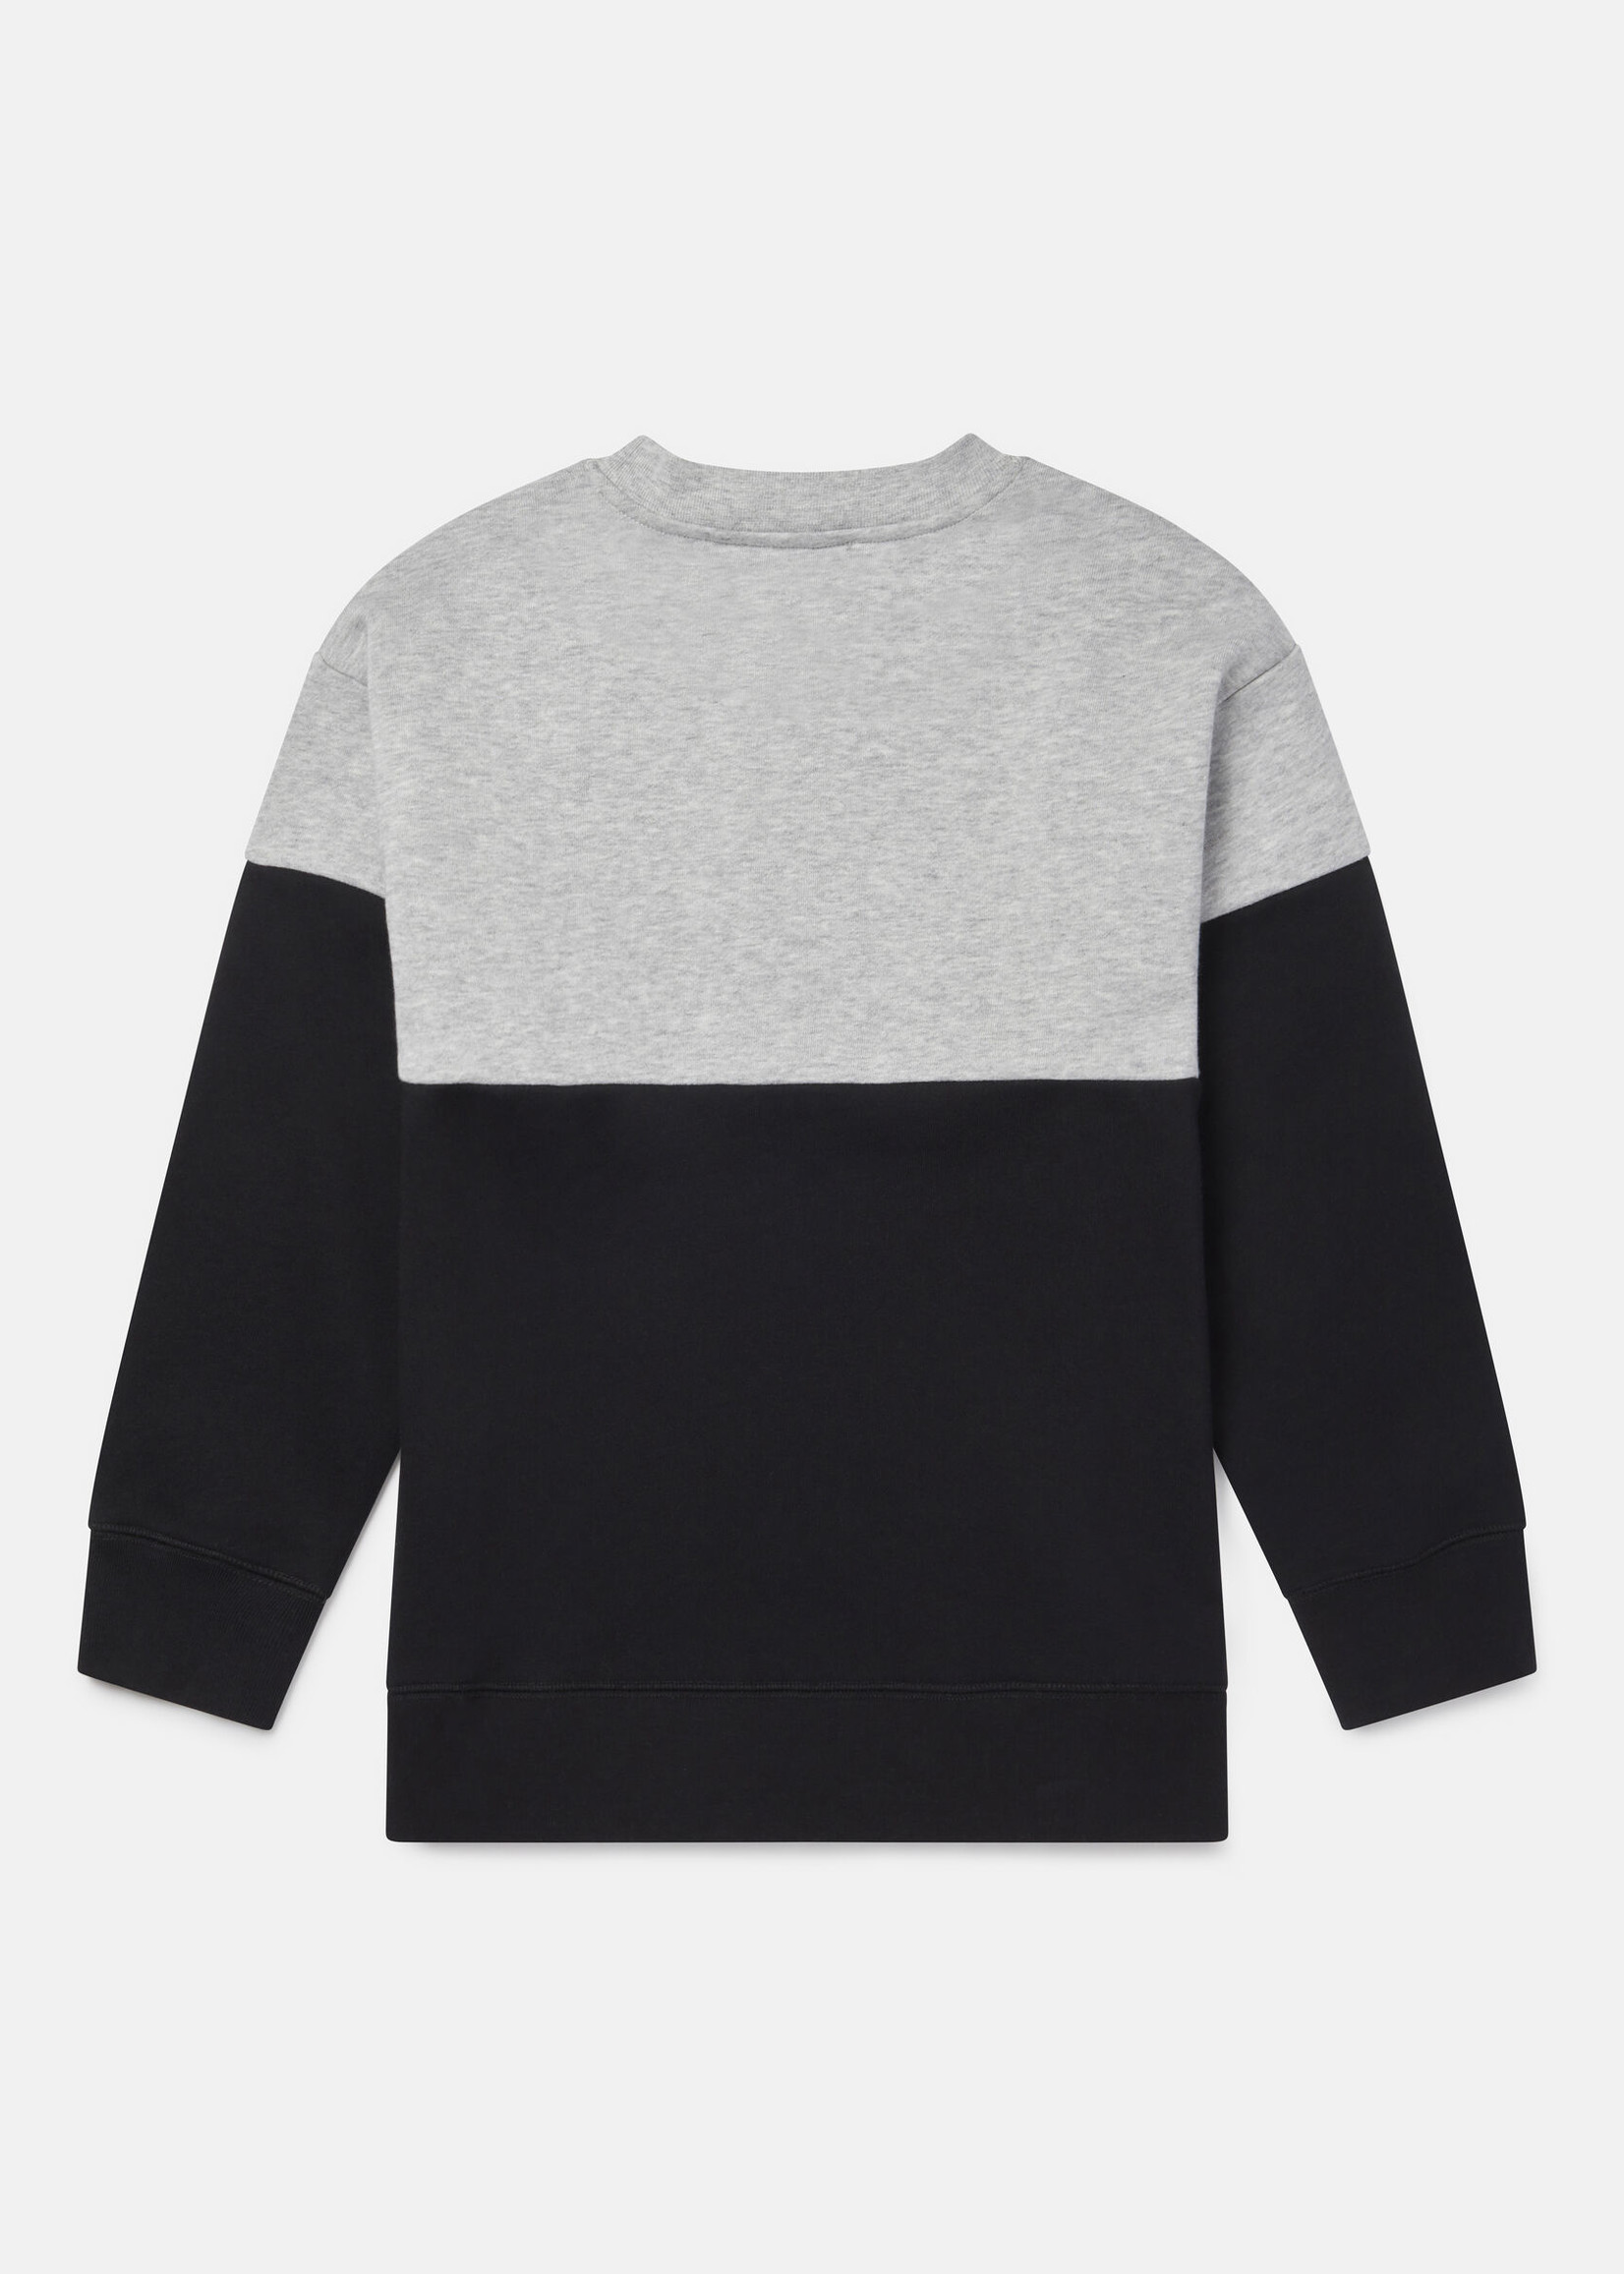 Stella McCartney Stella McCartney-AW21 602248 Oversized Wild Fleece Sweatshirt